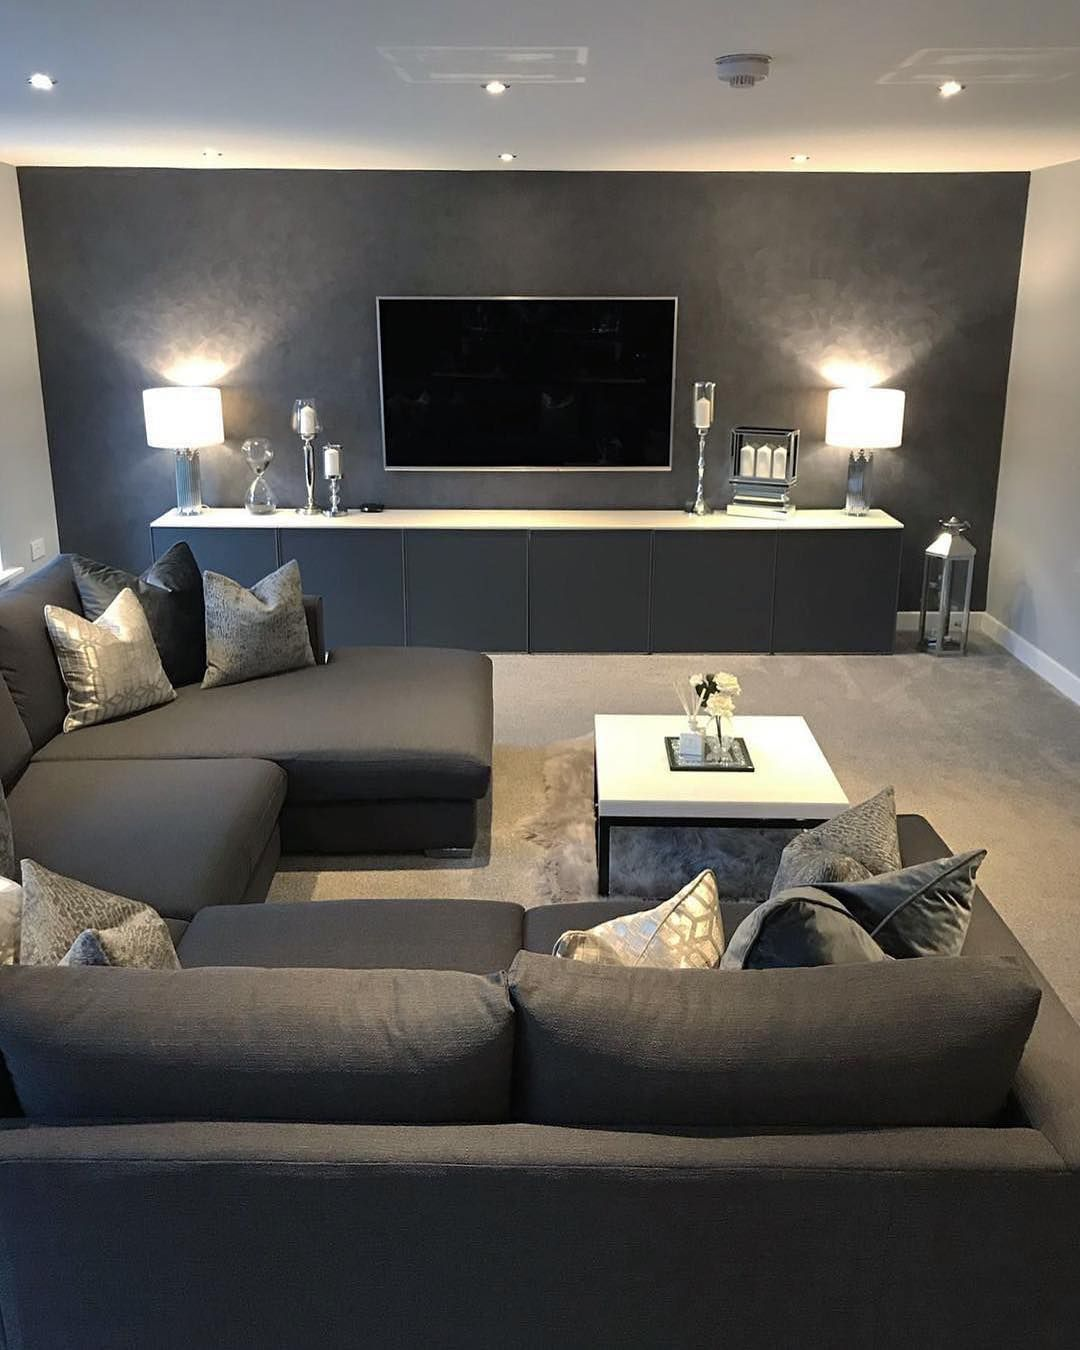 New the best interior designs in world design also home decor homedecorlivingroom interiors rh pinterest